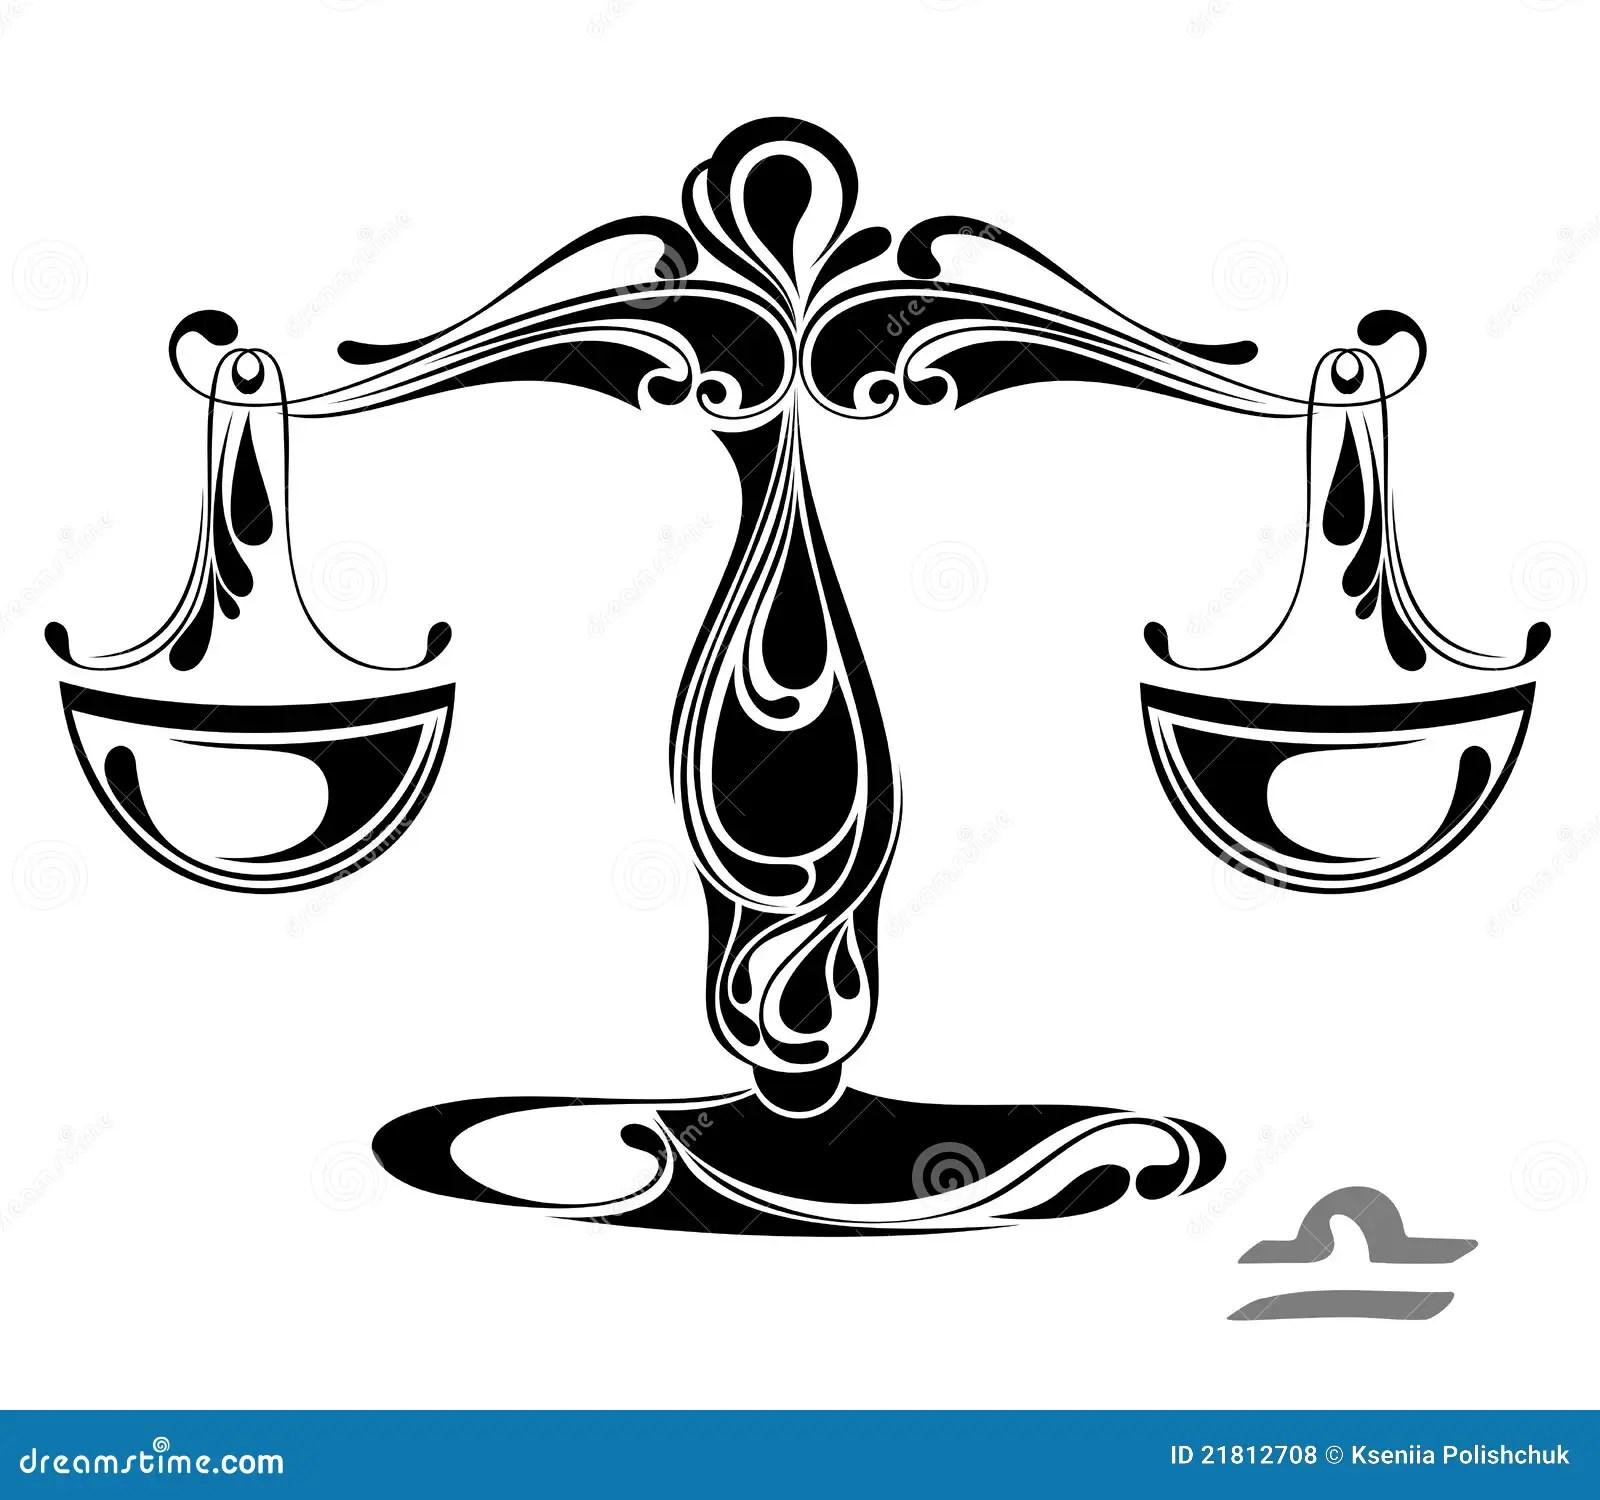 tatouages301 tatouage signe astrologique balance. Black Bedroom Furniture Sets. Home Design Ideas